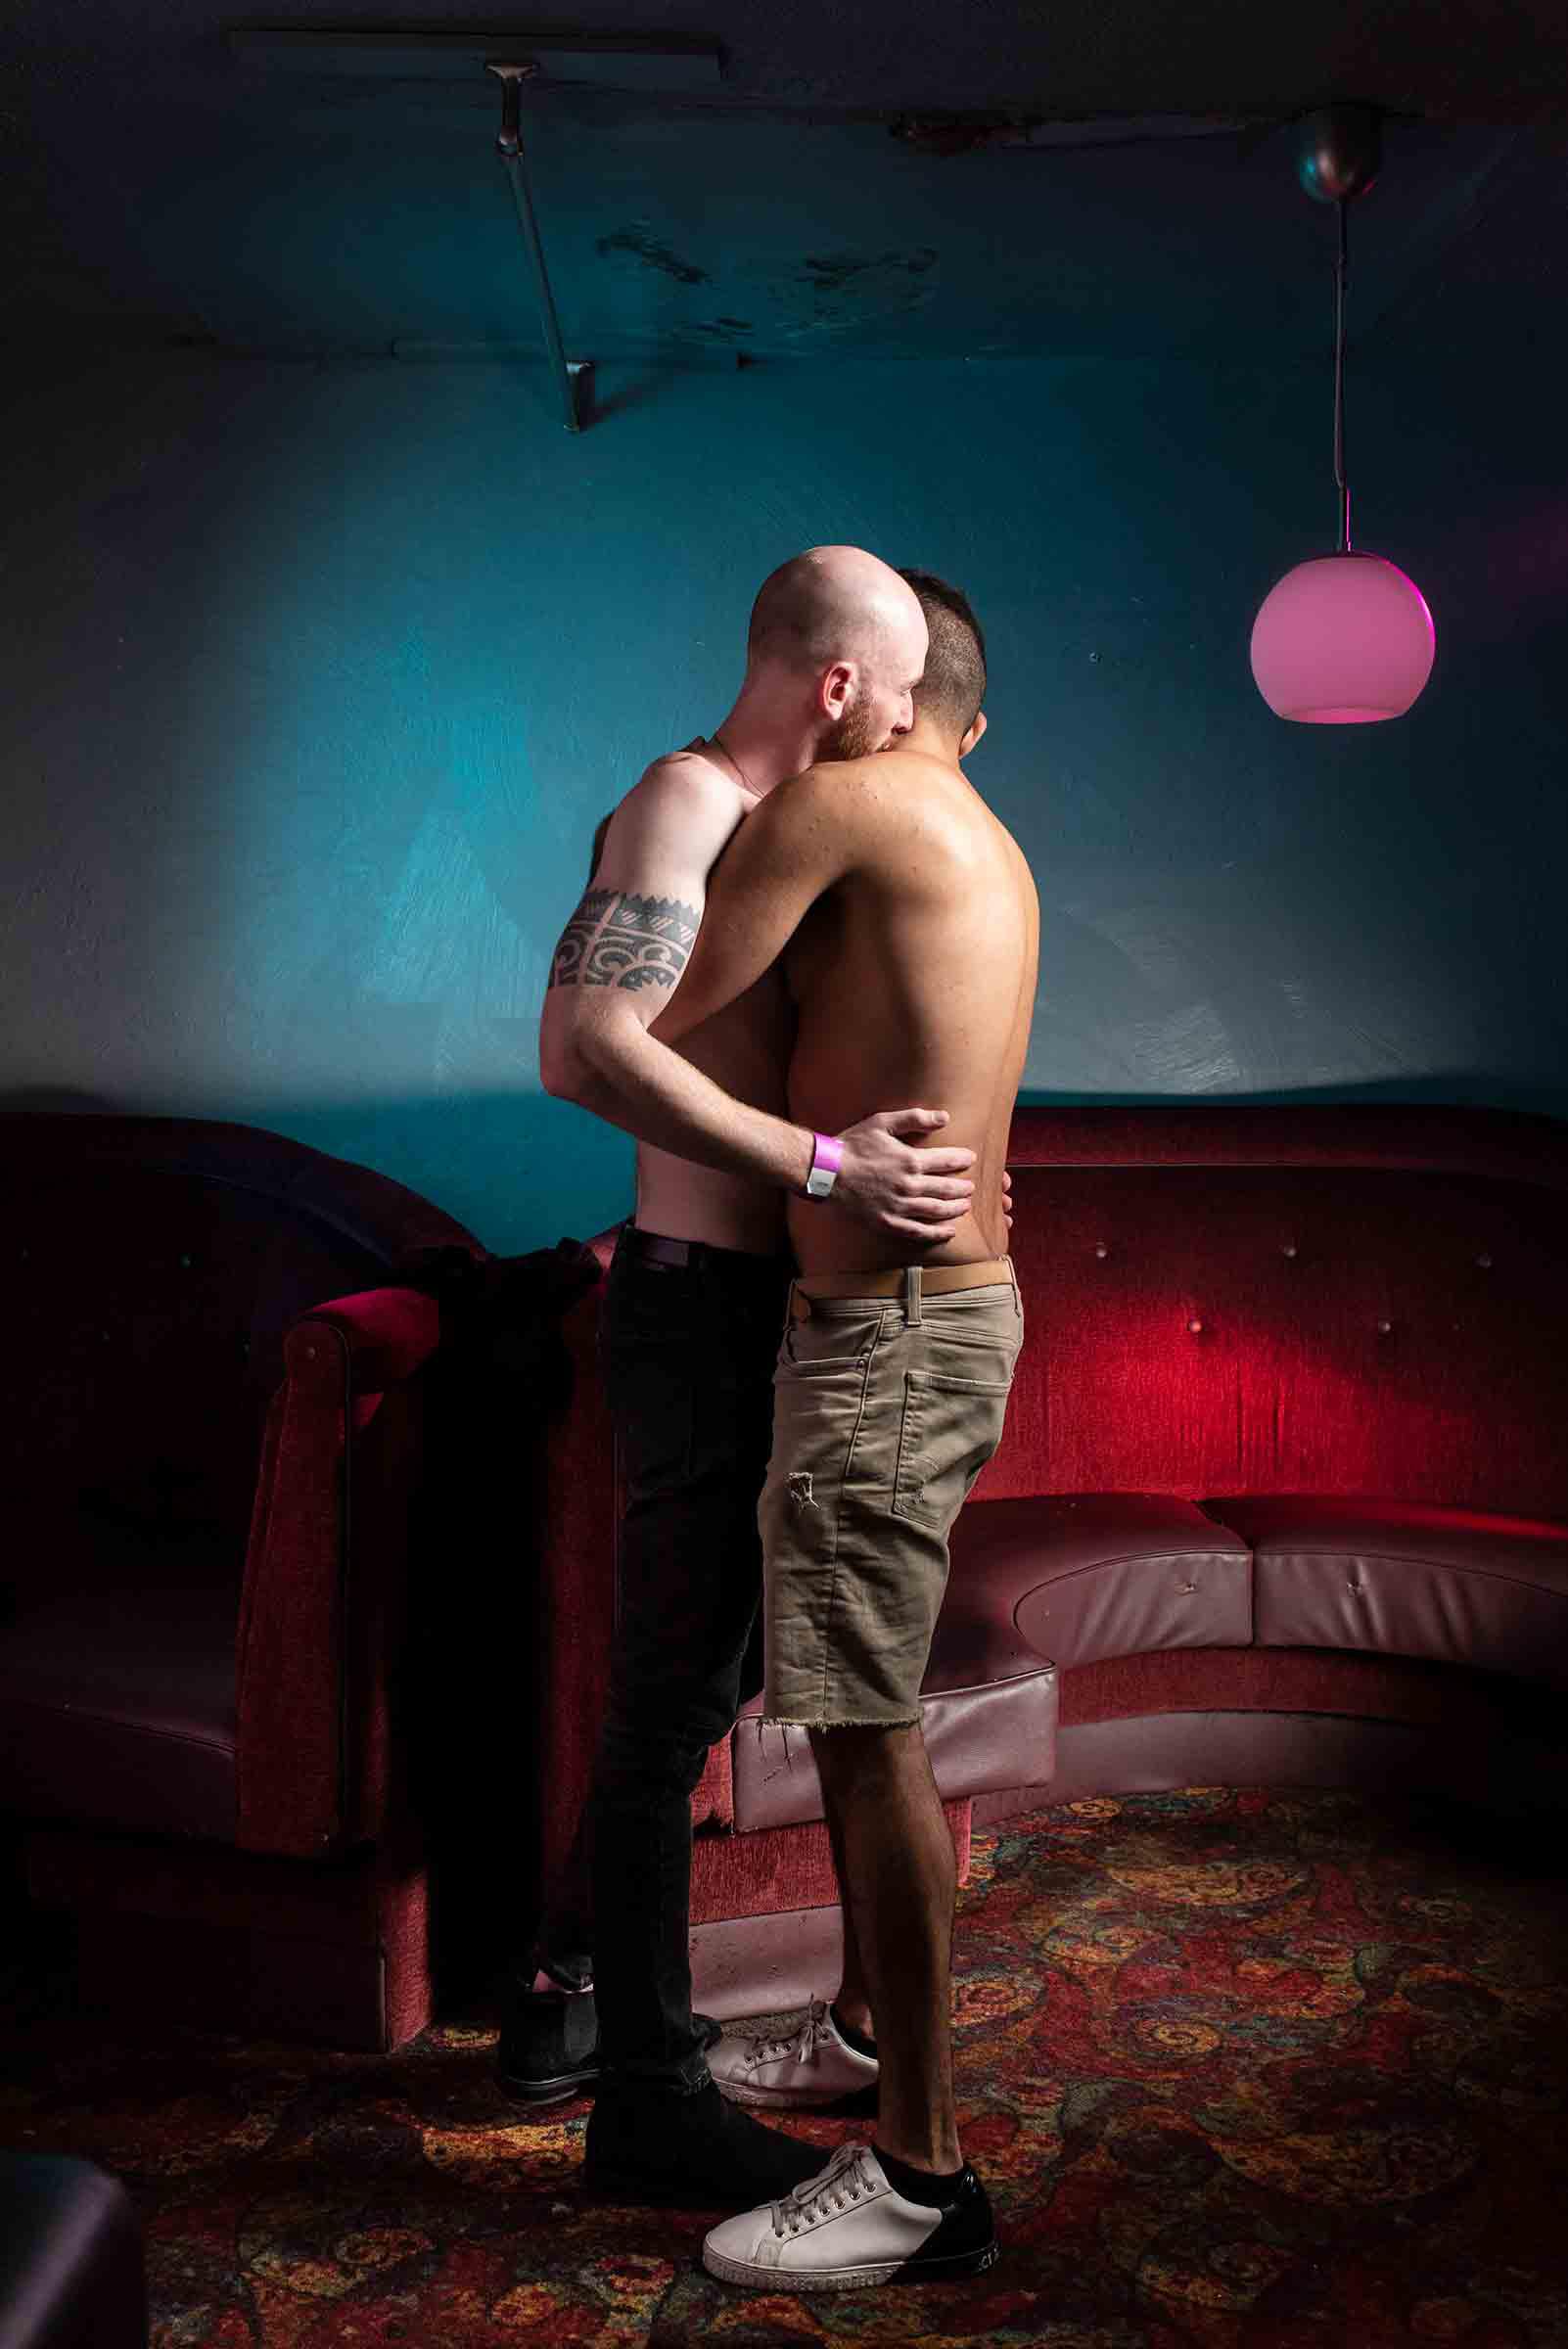 From Florida to Alaska, America's LGBTQ Bars Feel Like Home to Many,